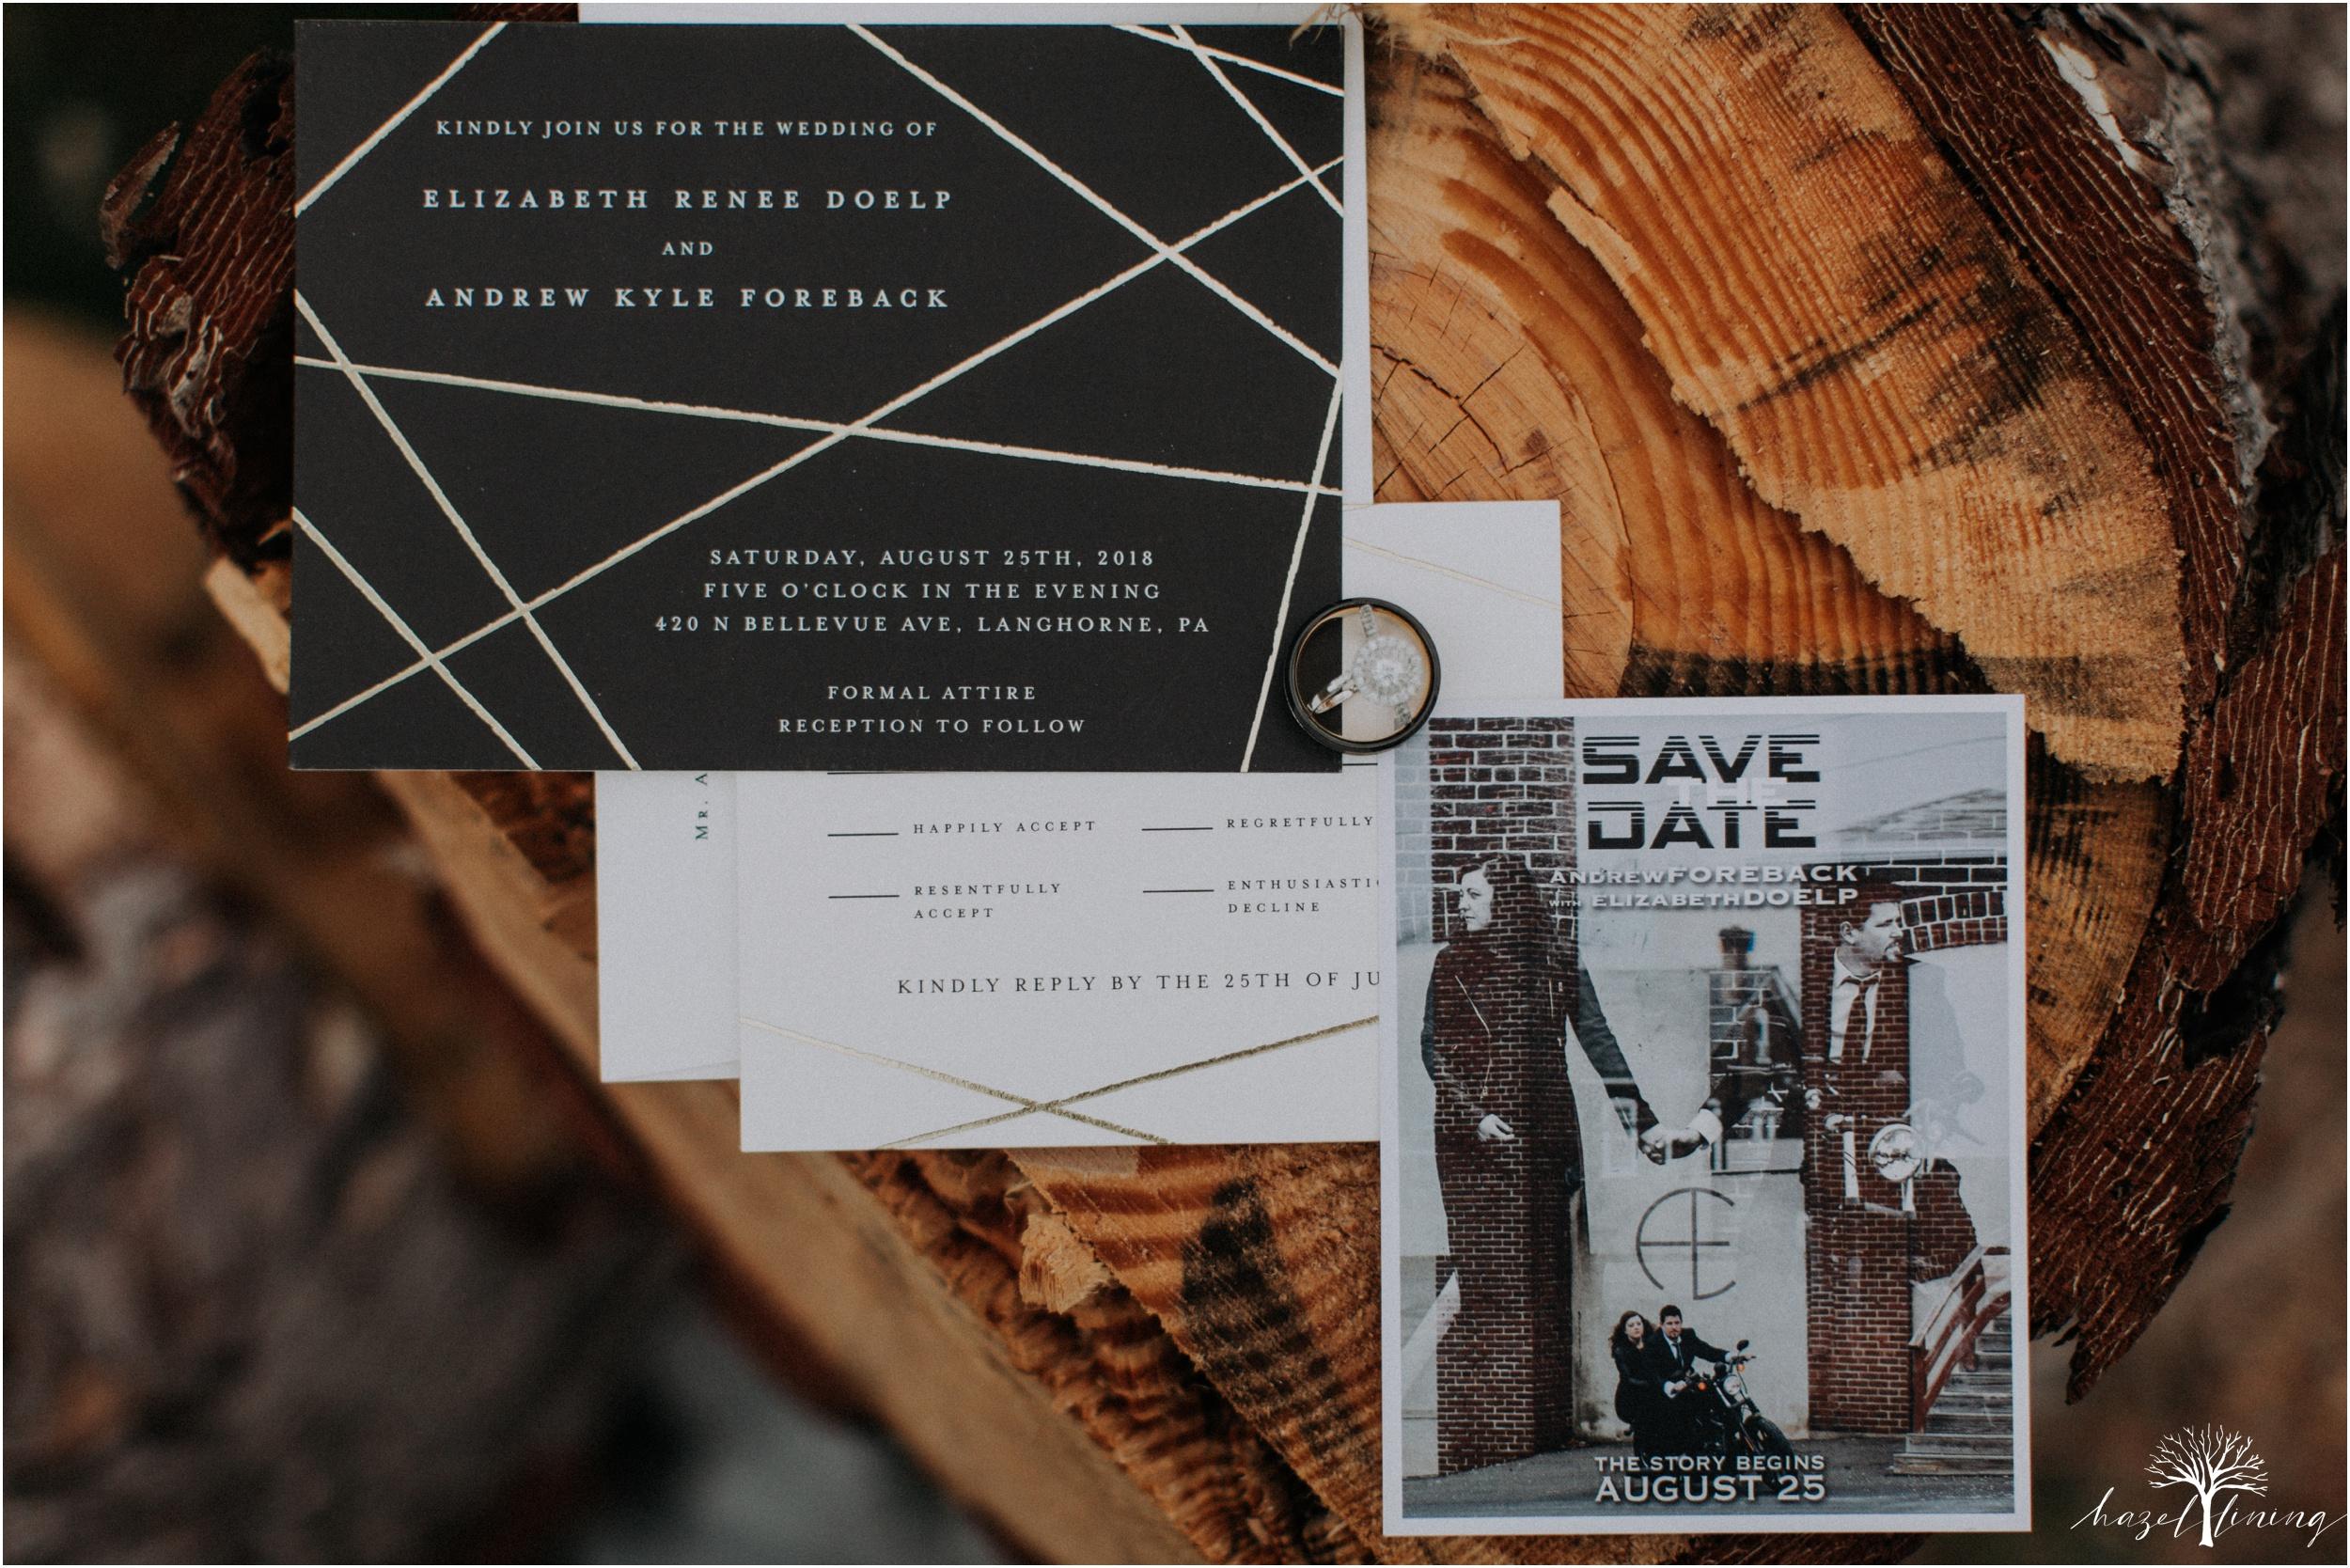 elizabeth-doelp-andrew-foreback-middletown-country-club-summer-langhorne-pennsylvania-wedding-hazel-lining-travel-wedding-elopement-photography_0001.jpg